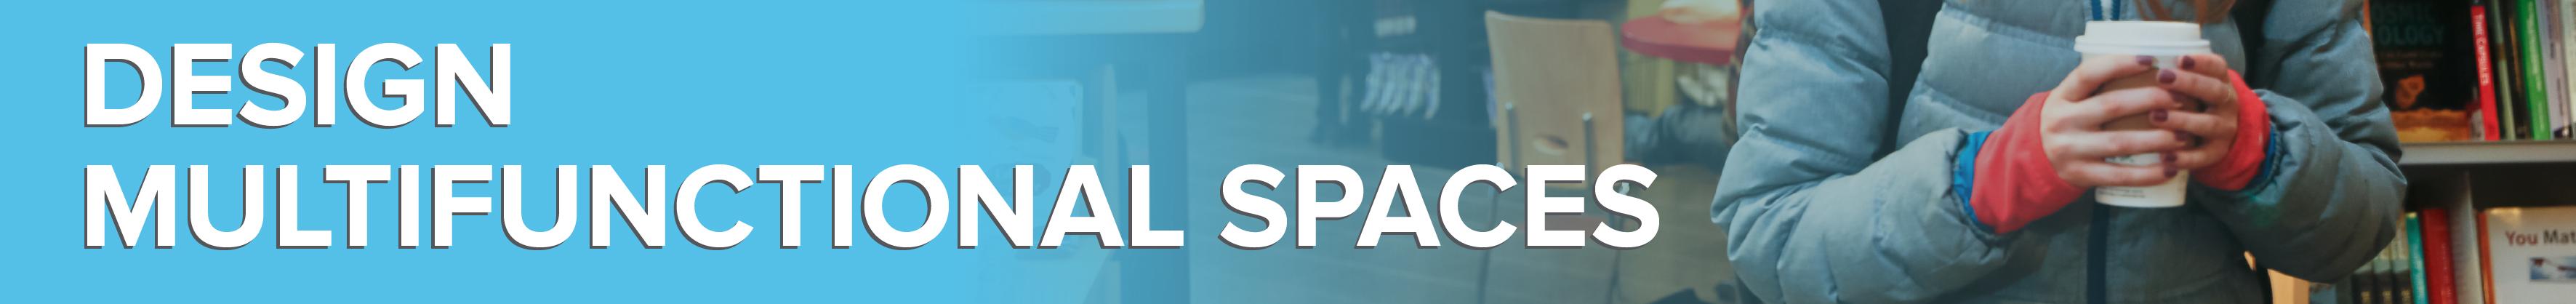 Design multifunctional spaces